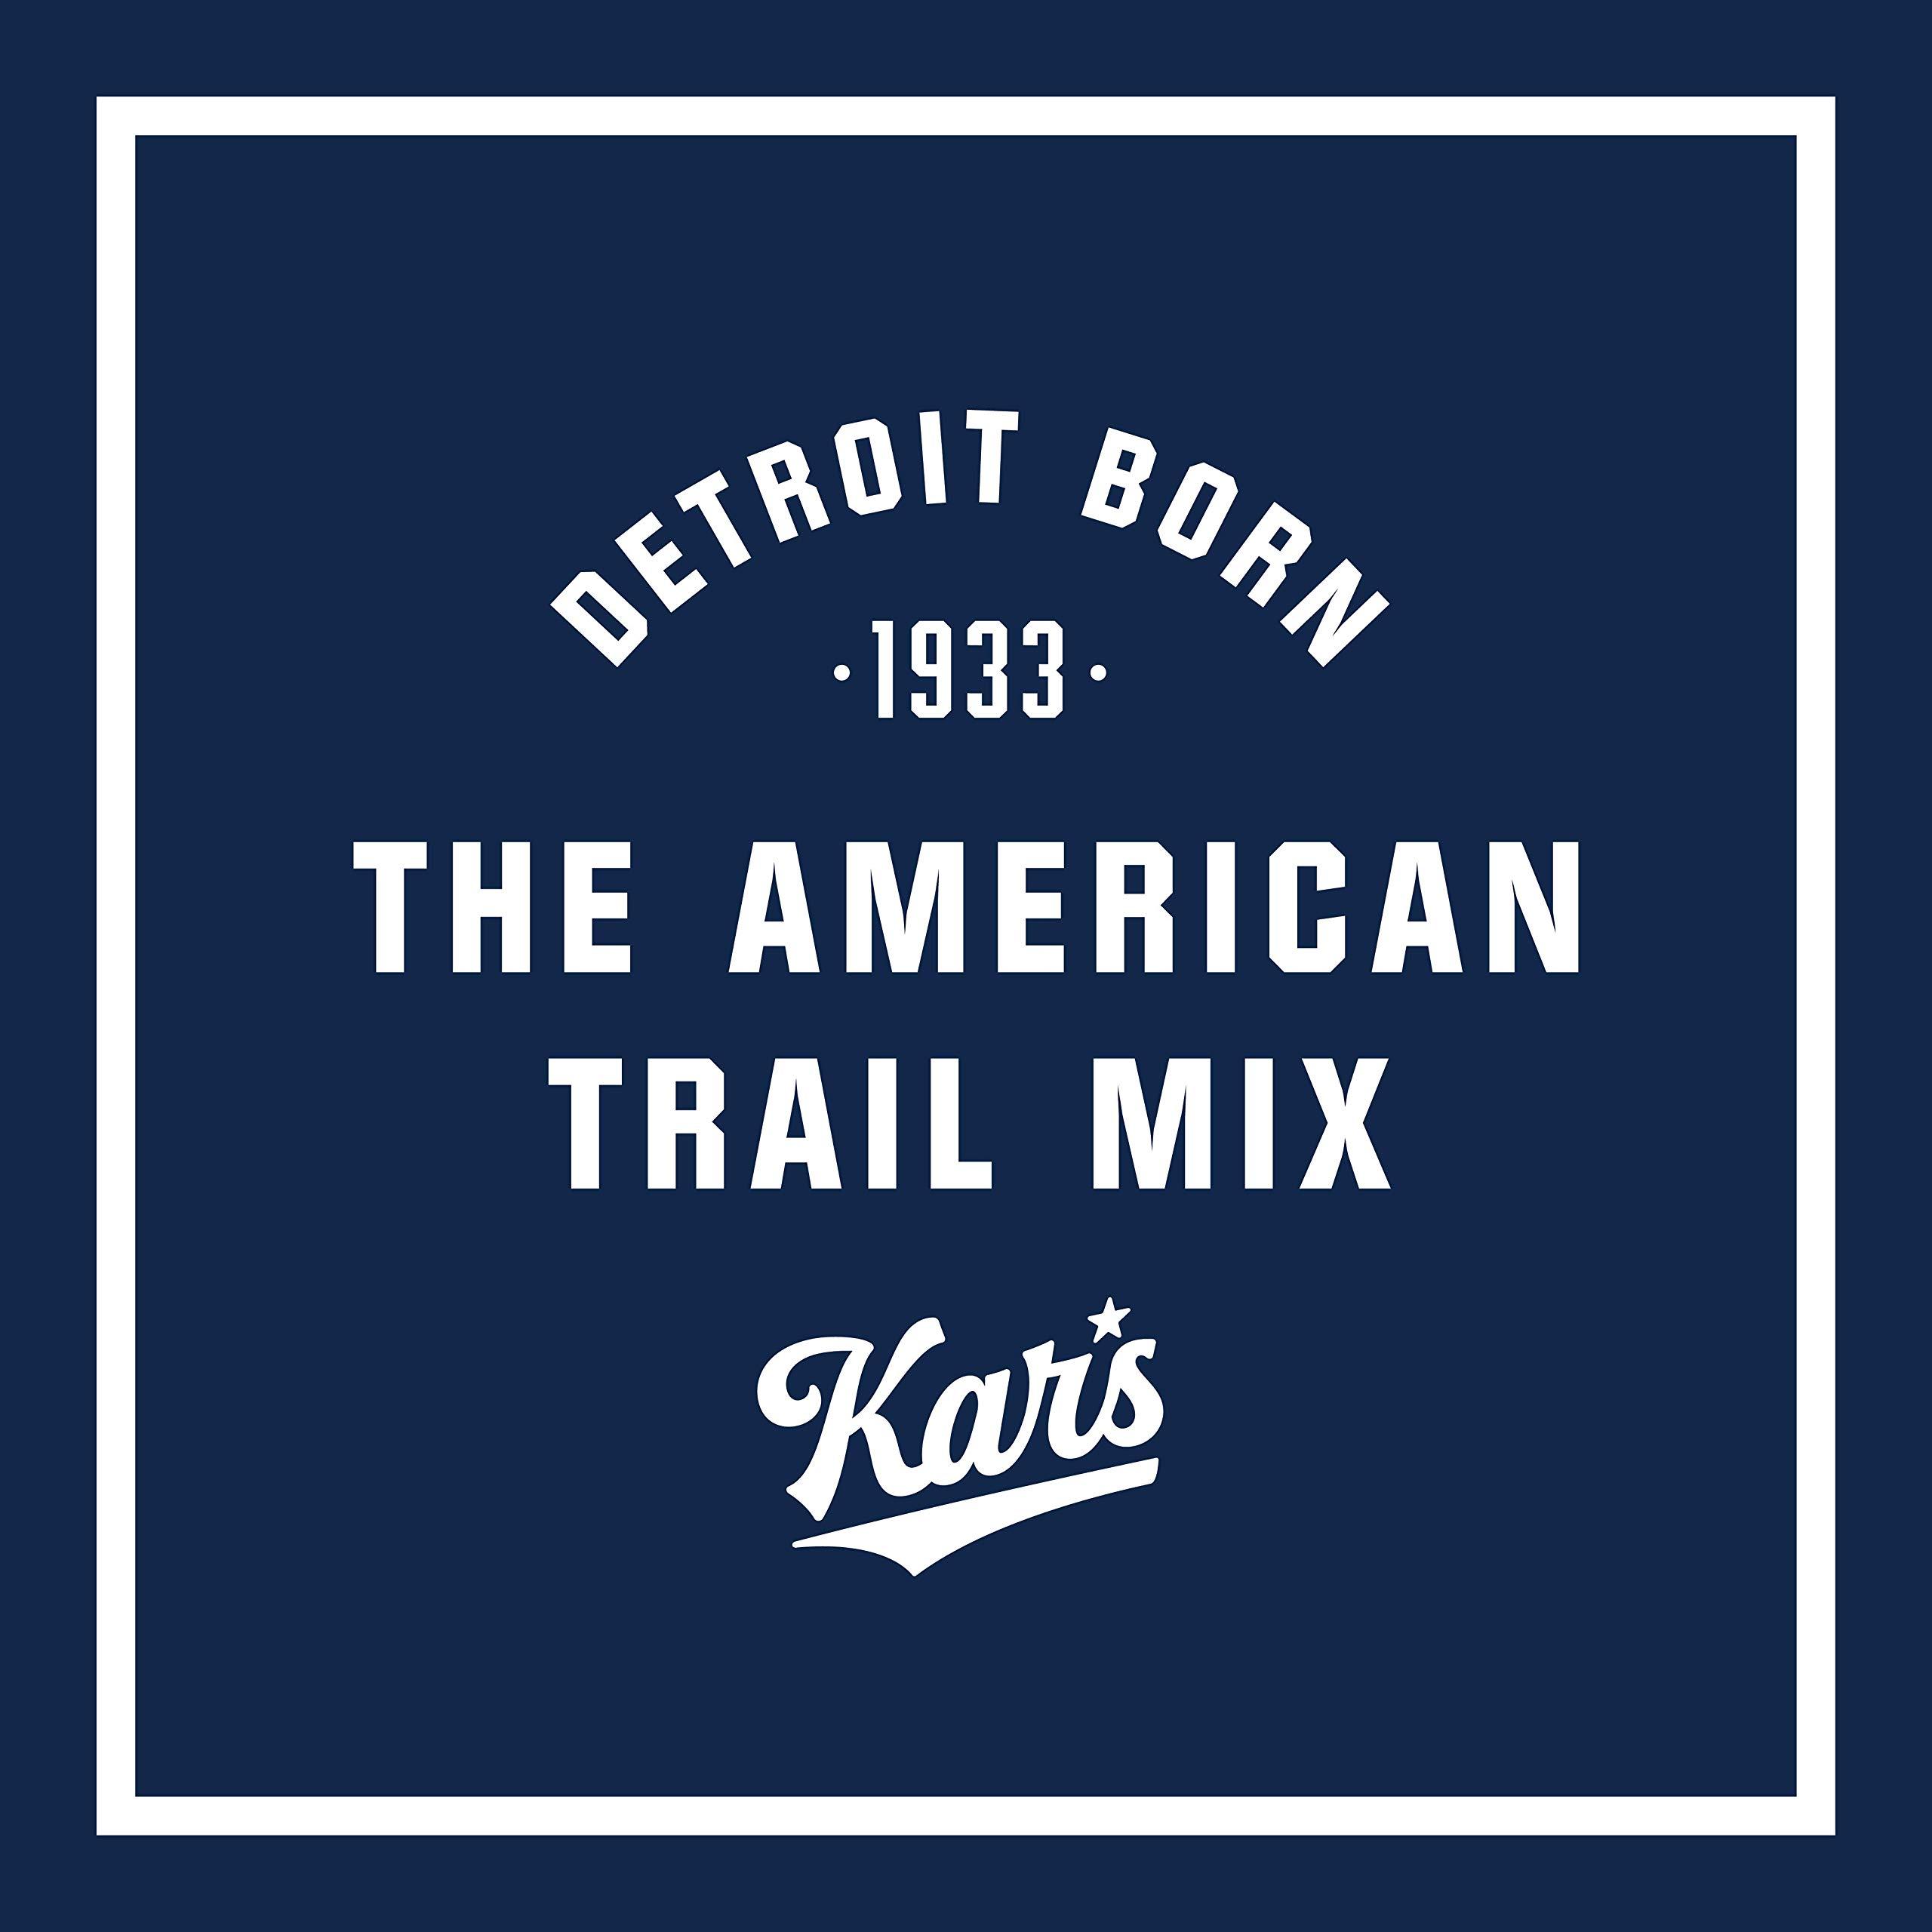 Kar's Nuts Sweet 'N Salty Trail Mix Snacks - High Protein Blend of Peanuts, Sunflower Kernels, Raisins & Chocolate Gems - Bulk Pack of 2.5 oz Individual Single Serve Bags (Pack of 36)